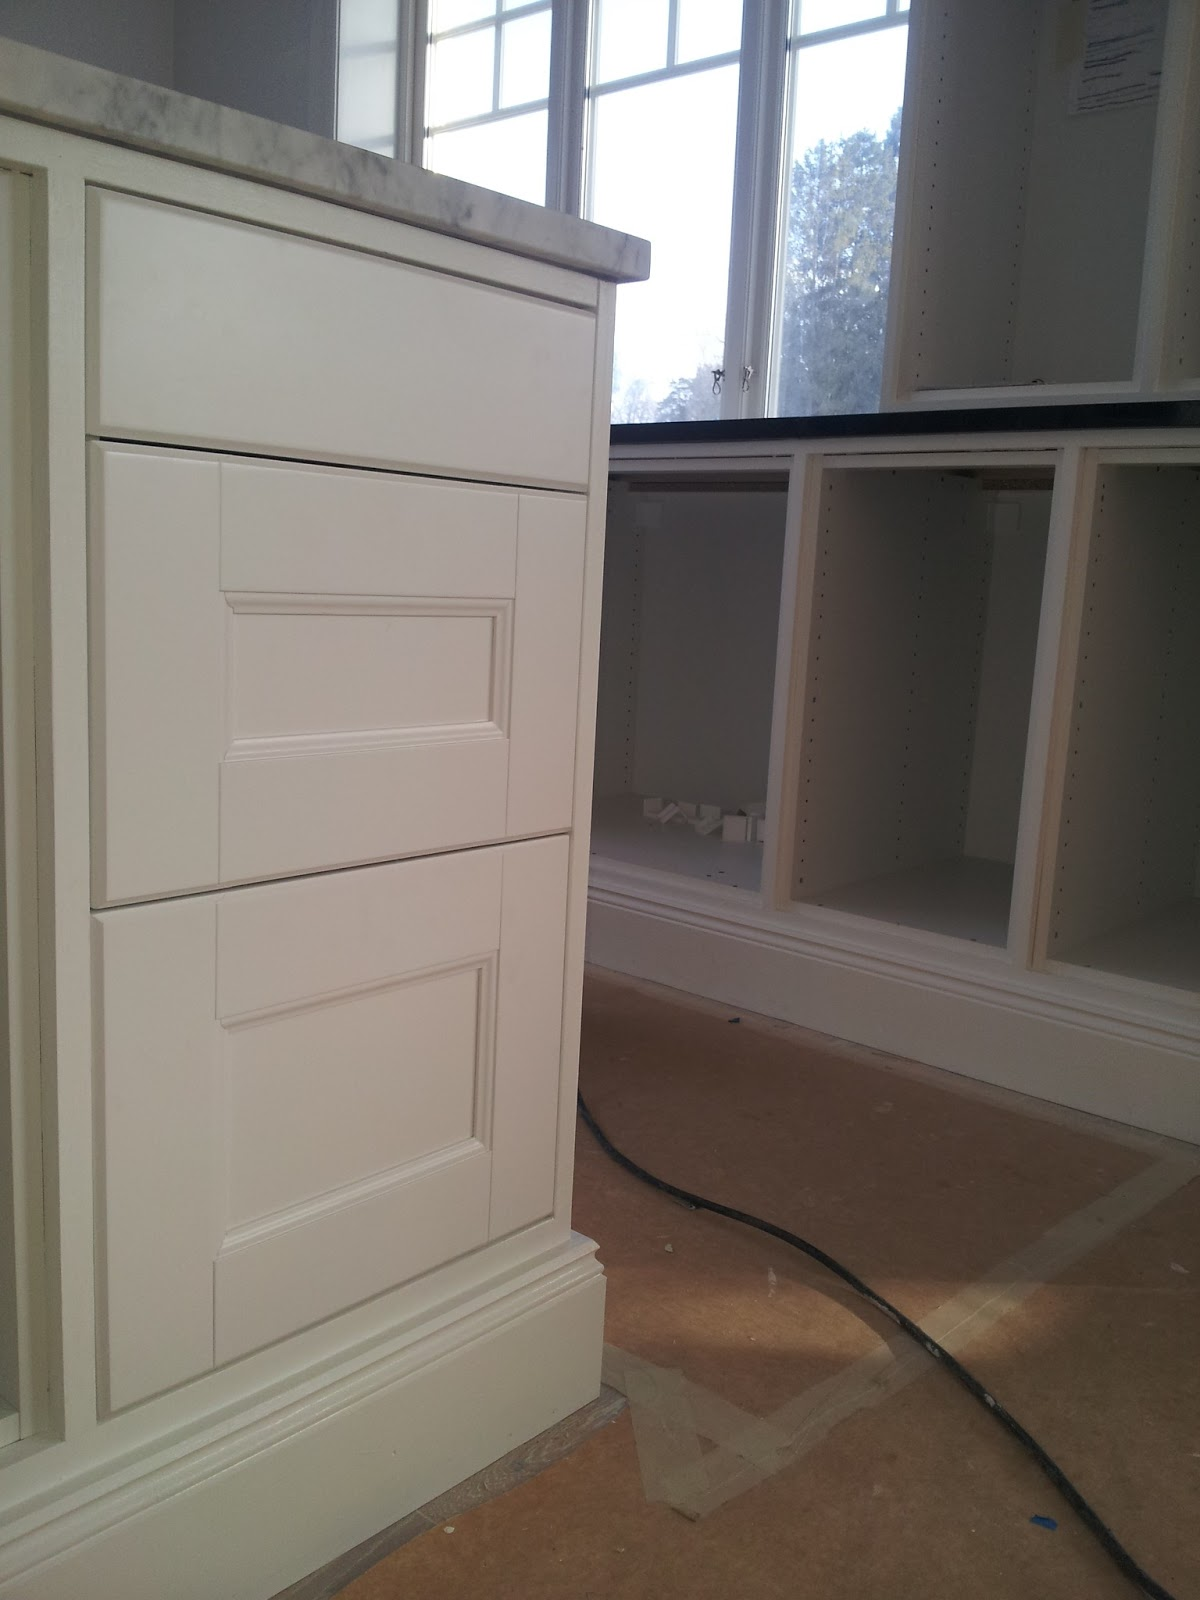 Carraramarmor i köket ~ zeedub.com